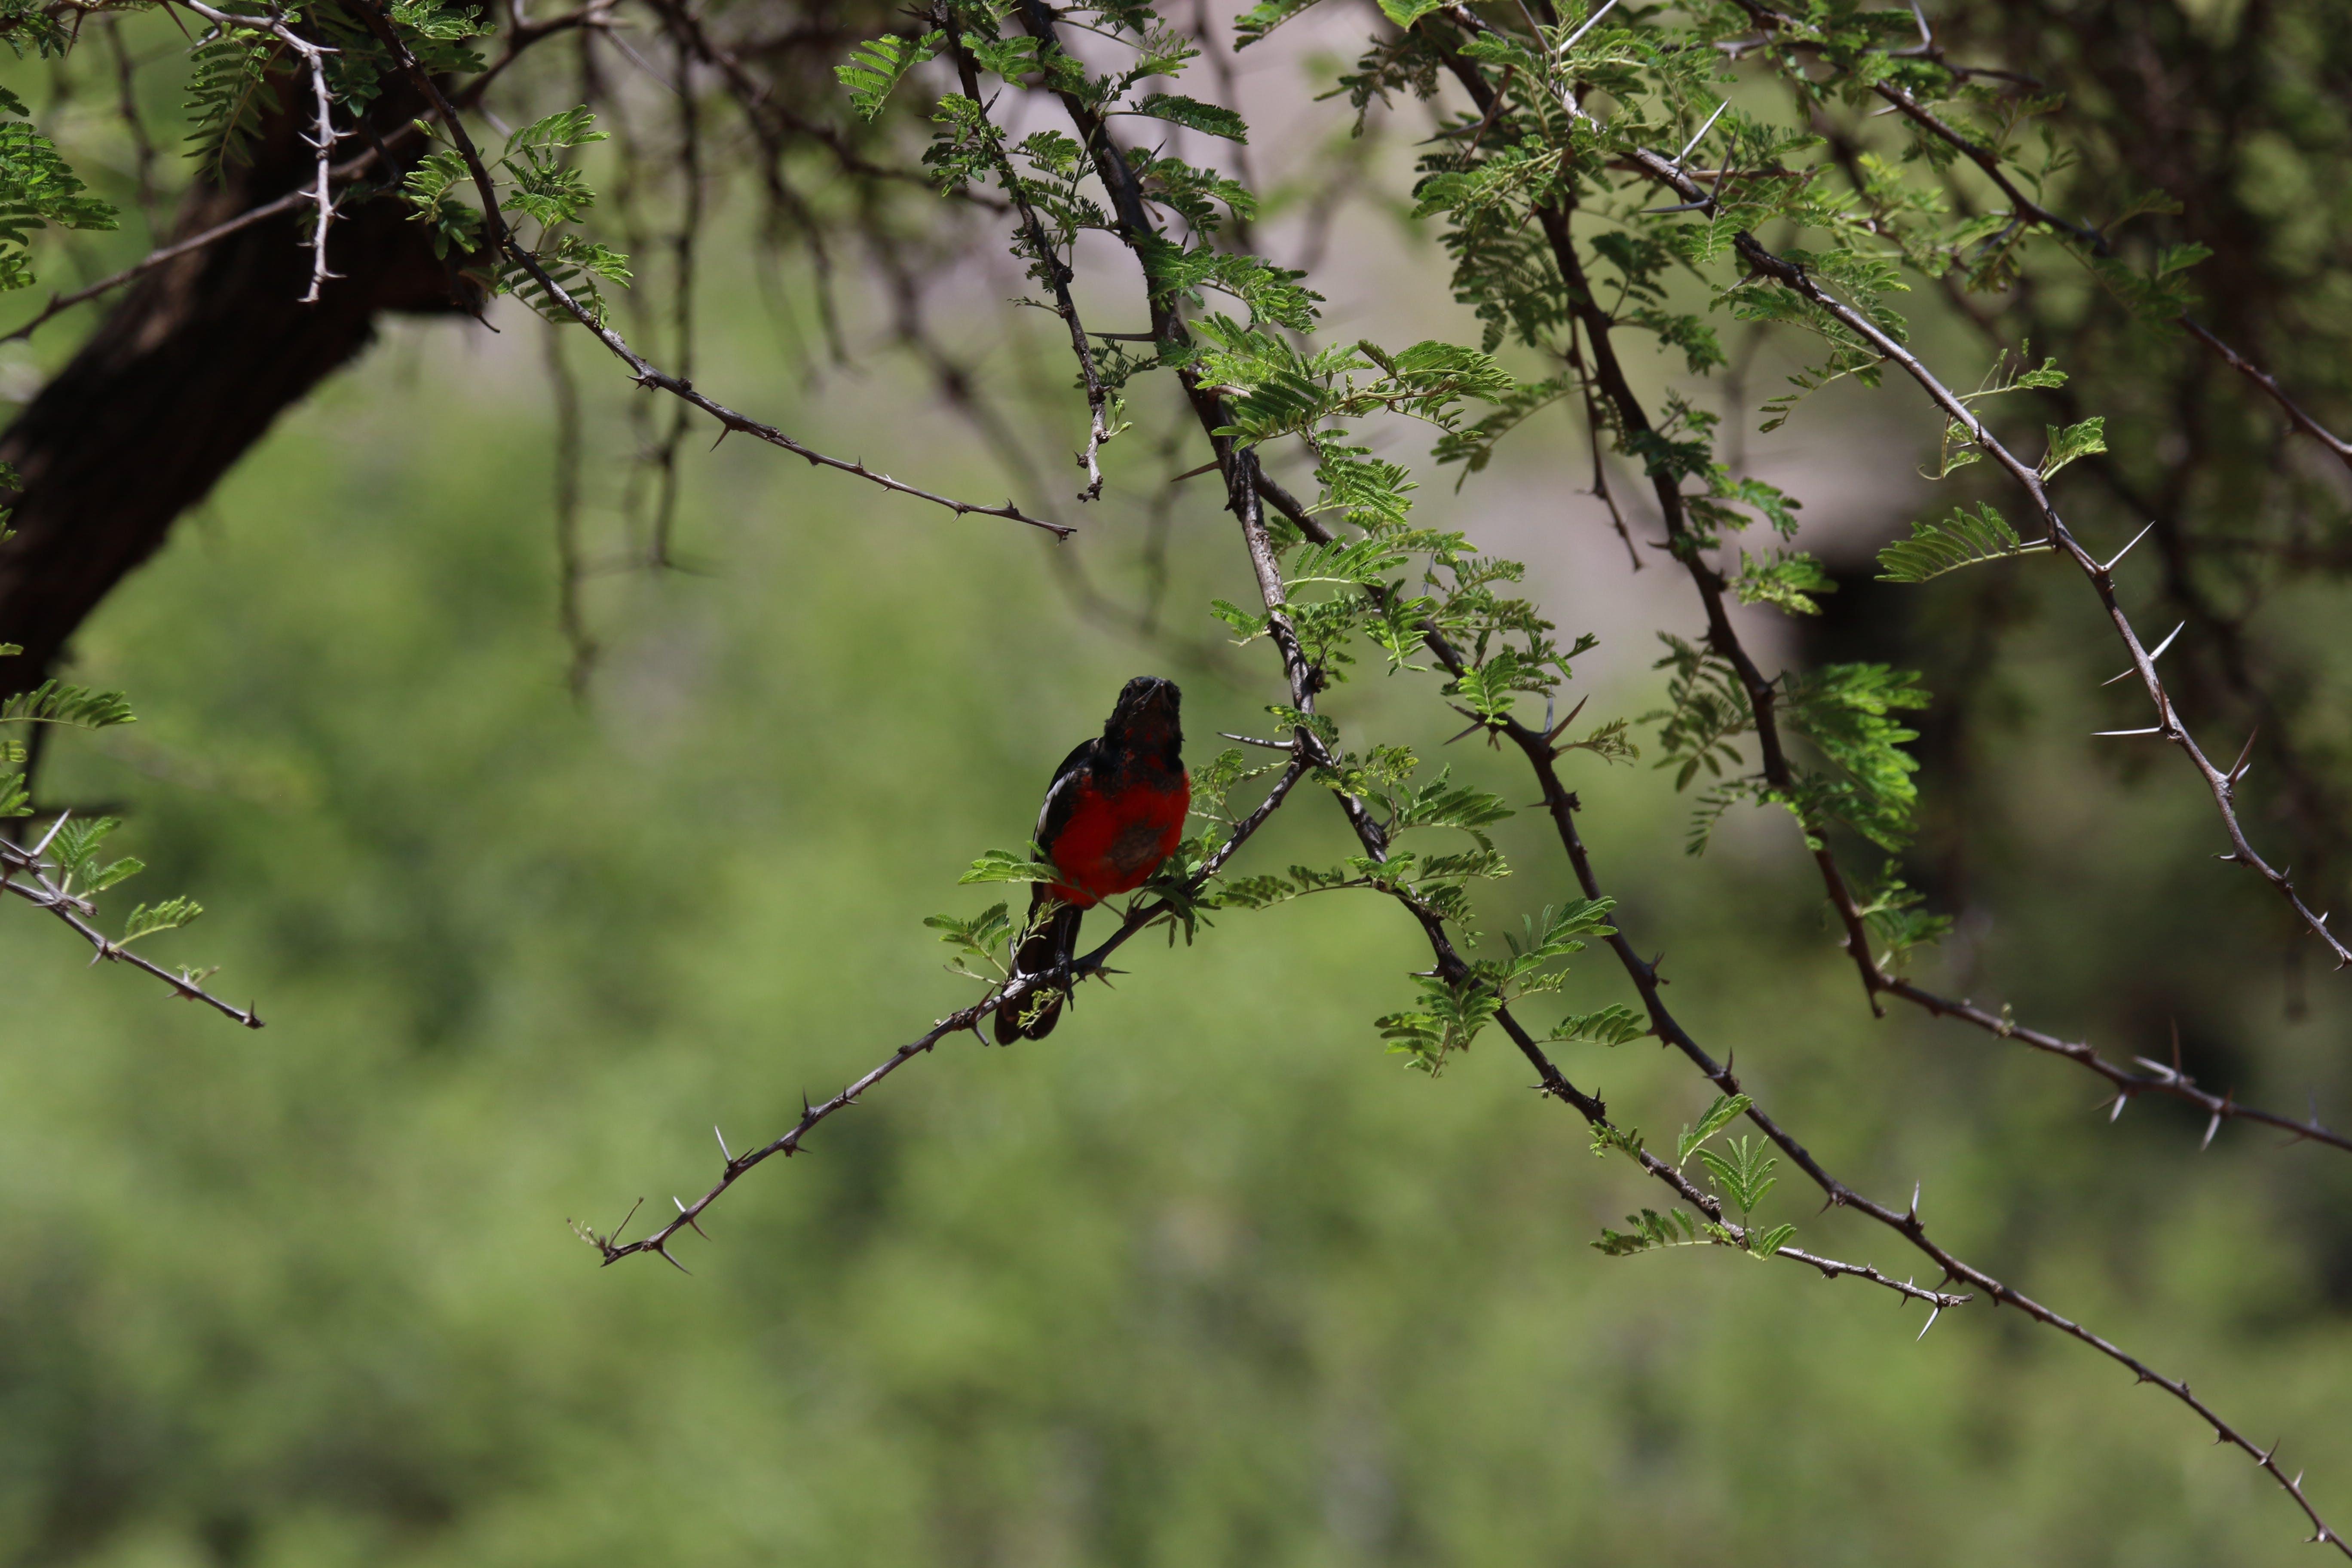 Free stock photo of nature, bird, red, grass